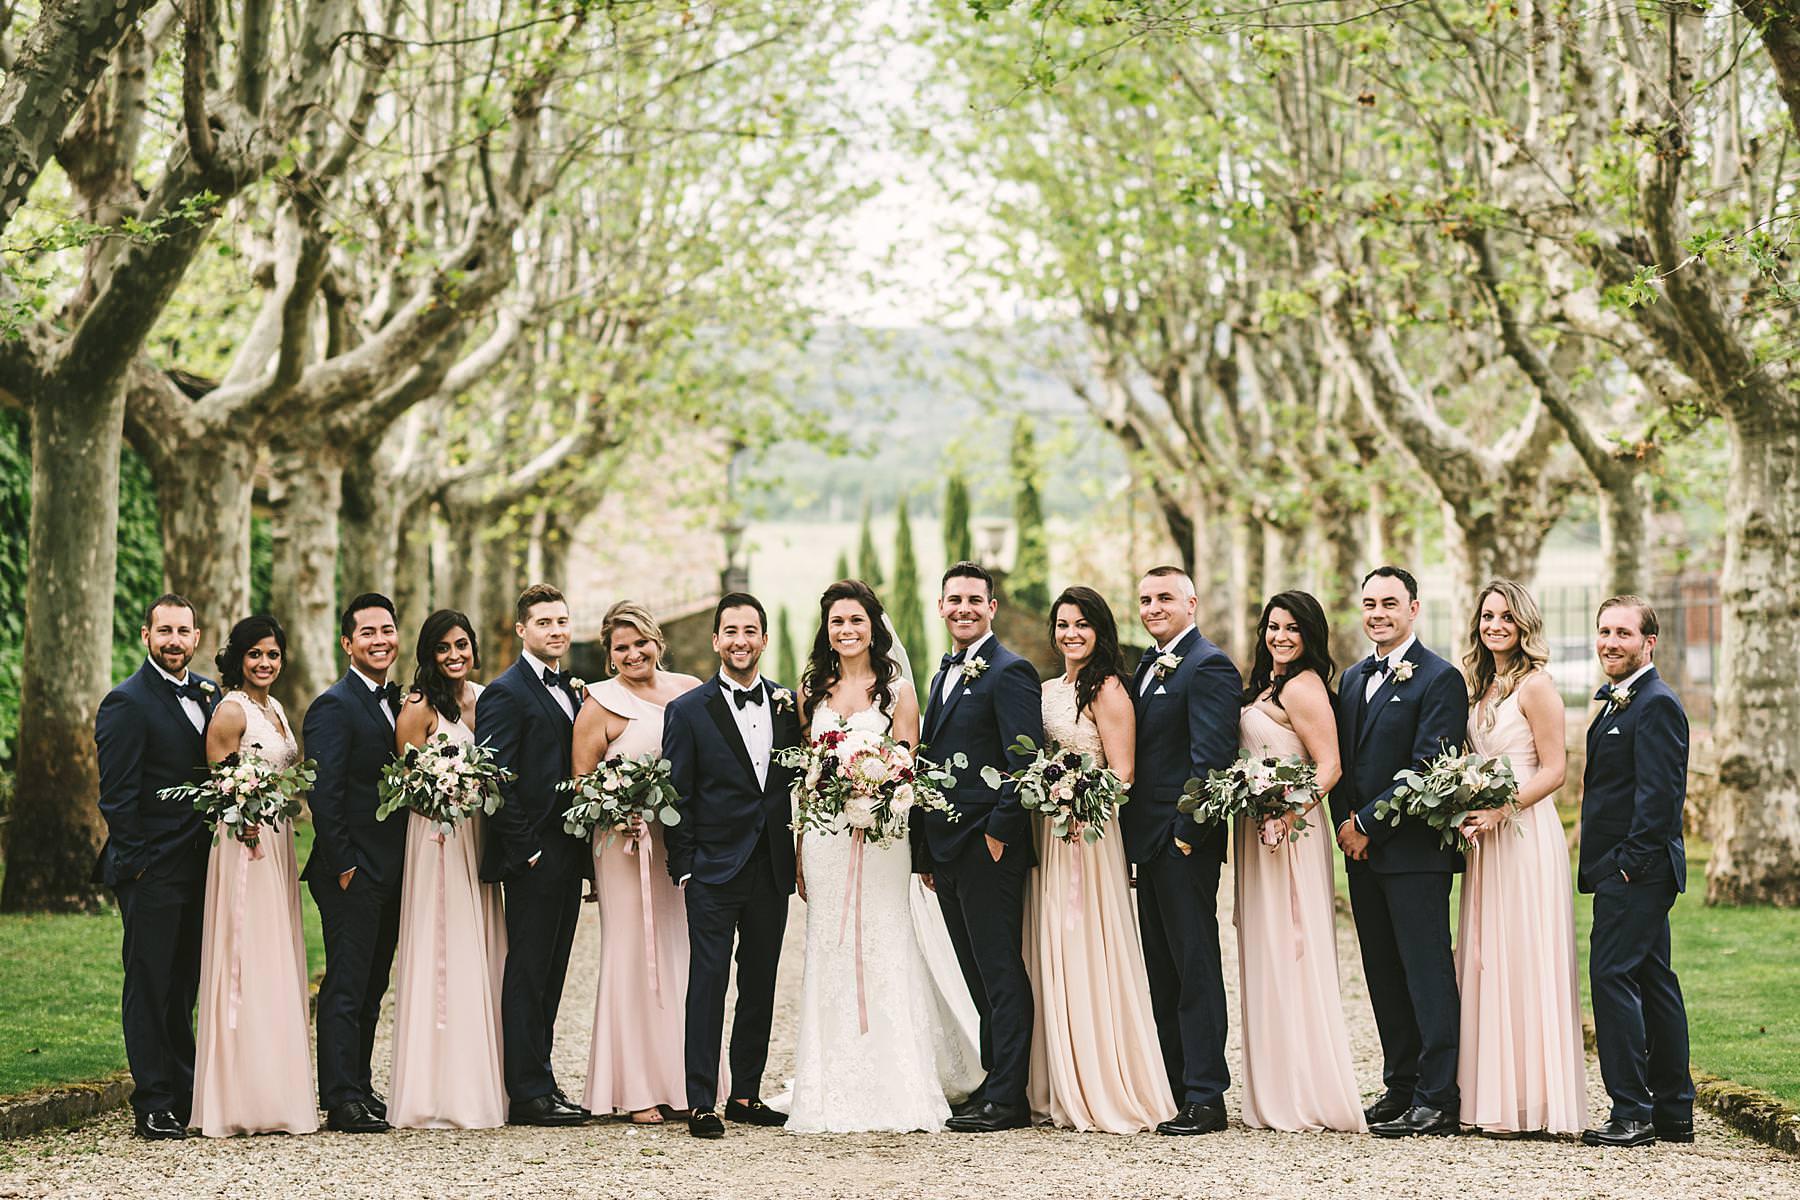 La Dolce Vita Style destination wedding in Tuscany countryside. Villa La Selva Wine Resort bridal party wedding photo